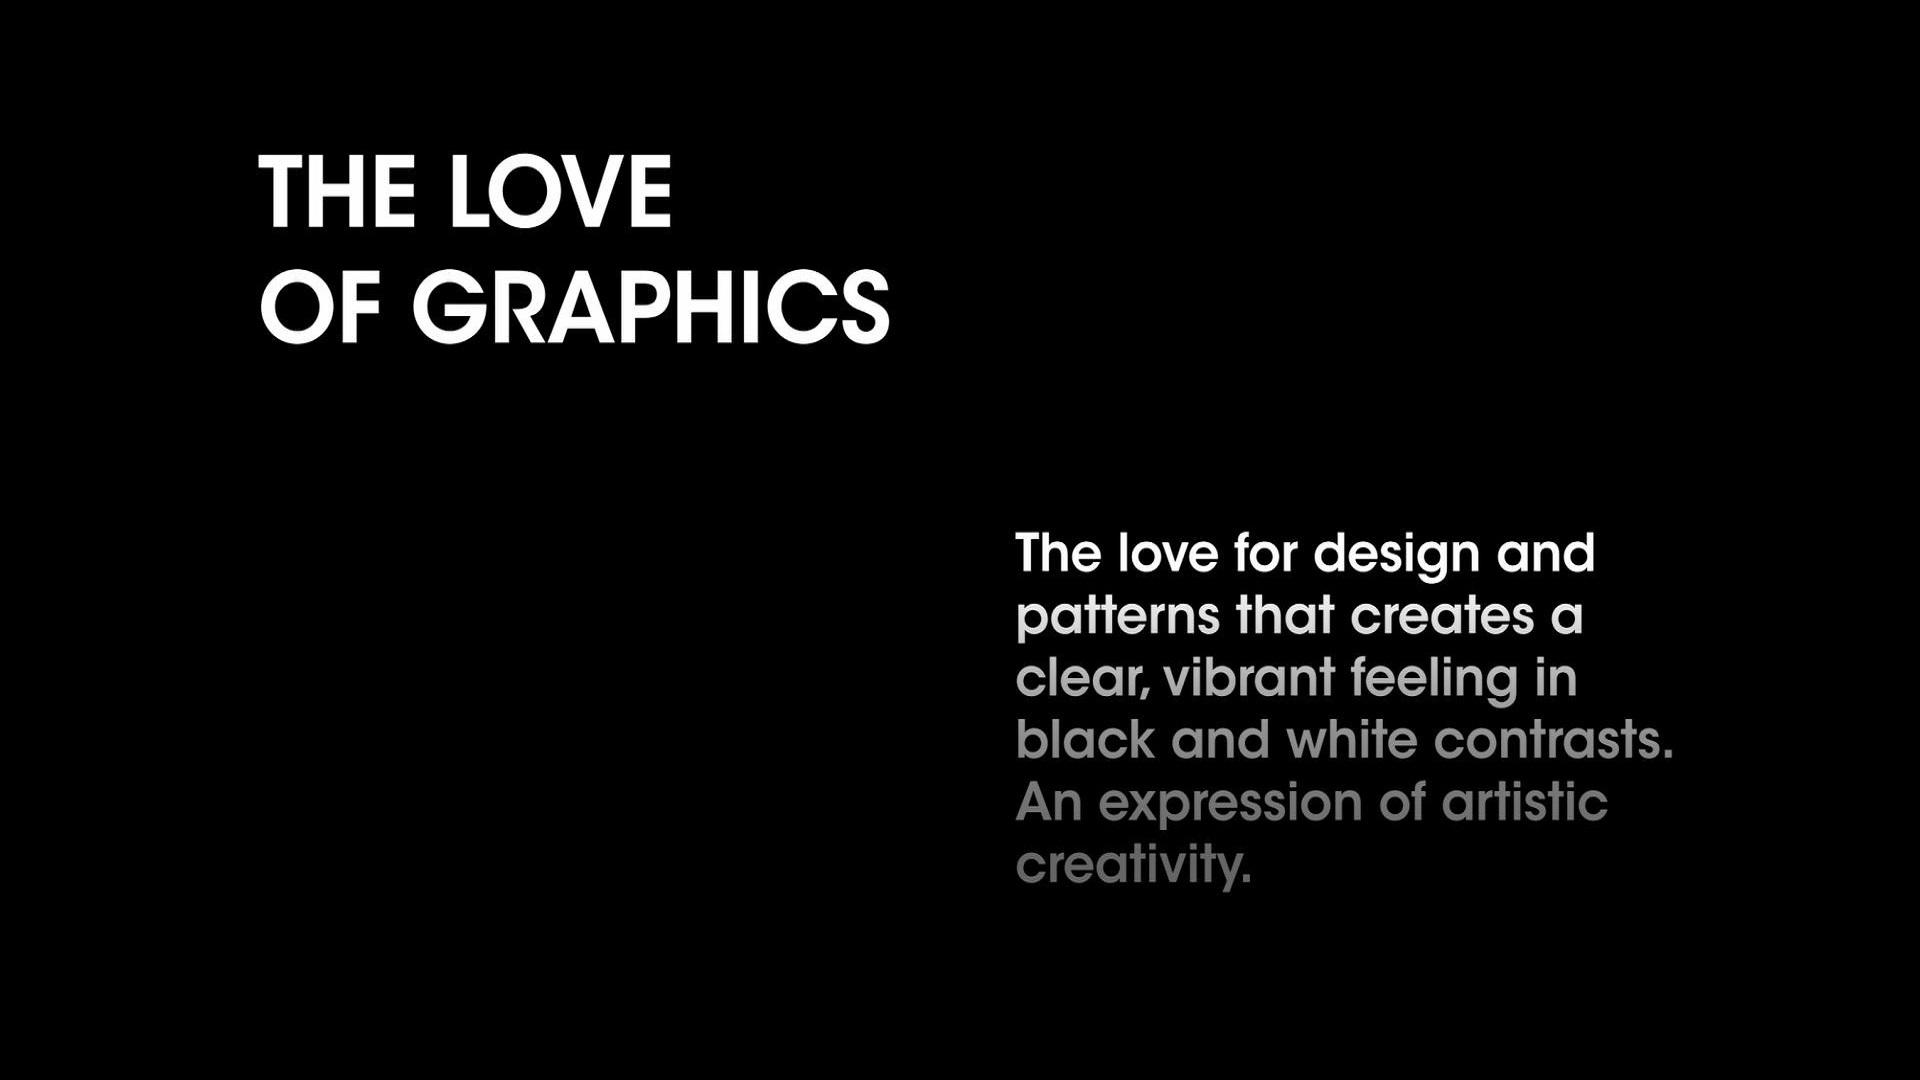 Love of Graphics